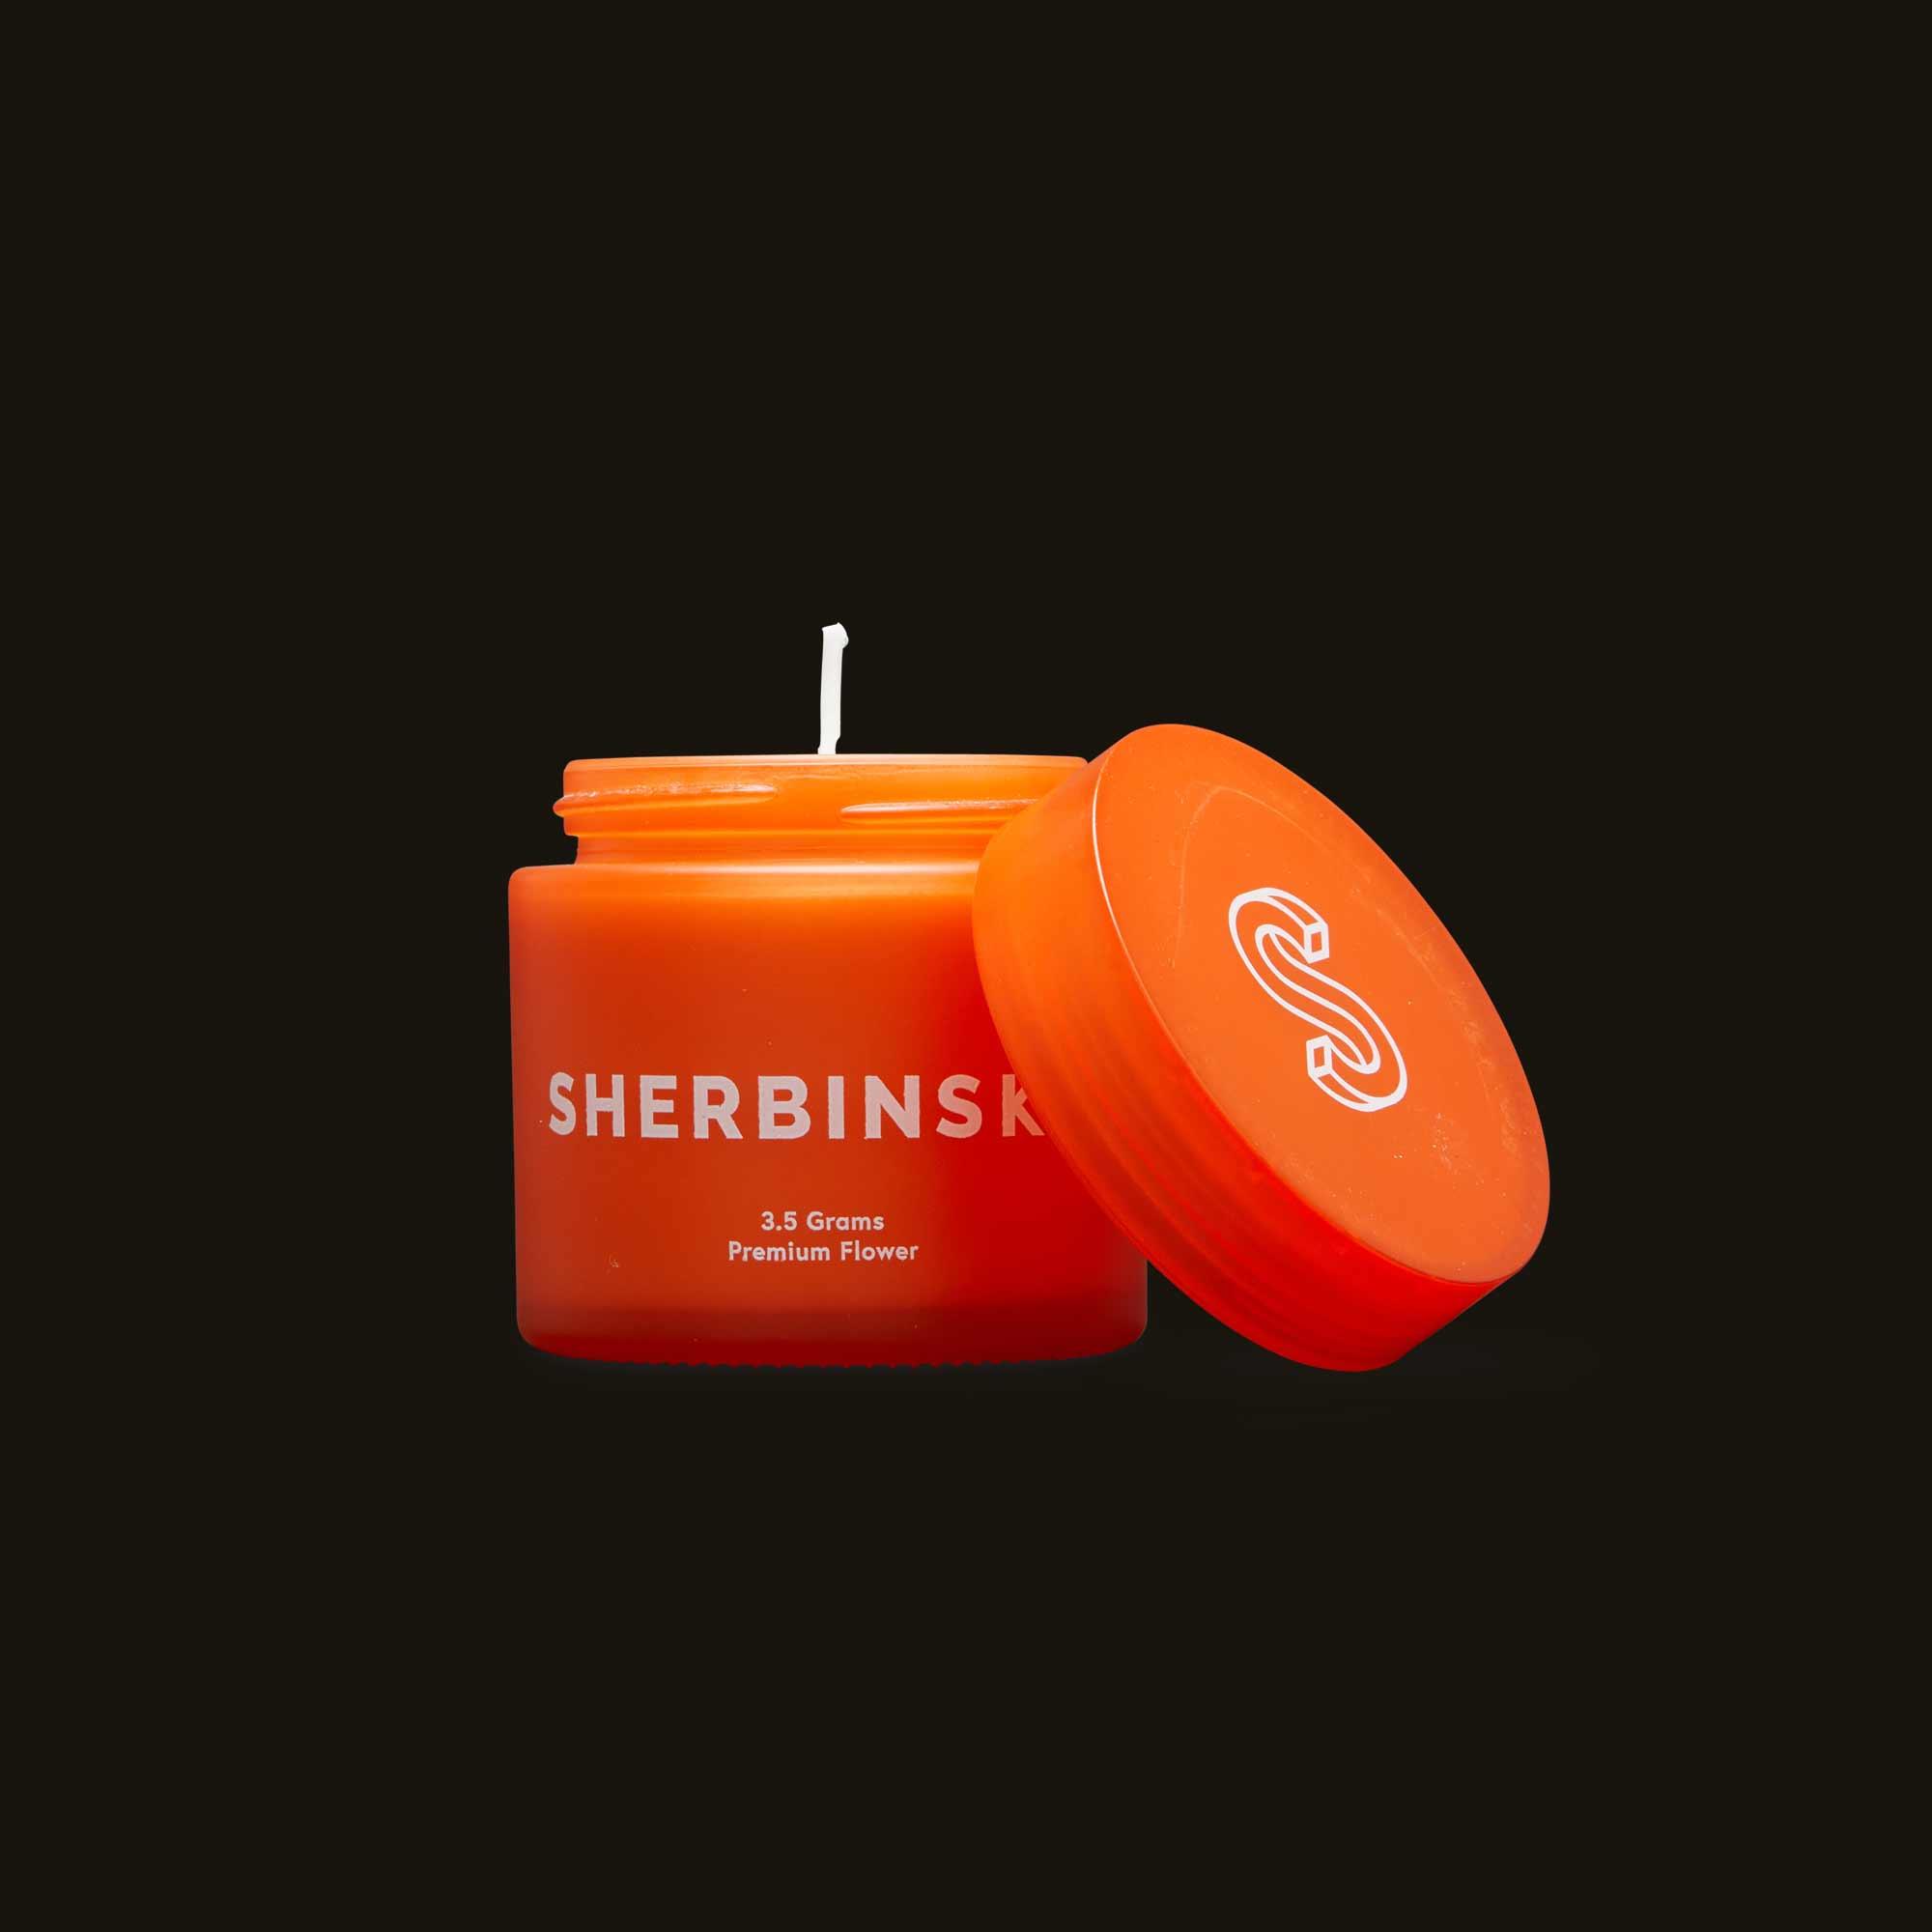 Sherbinskis Candle